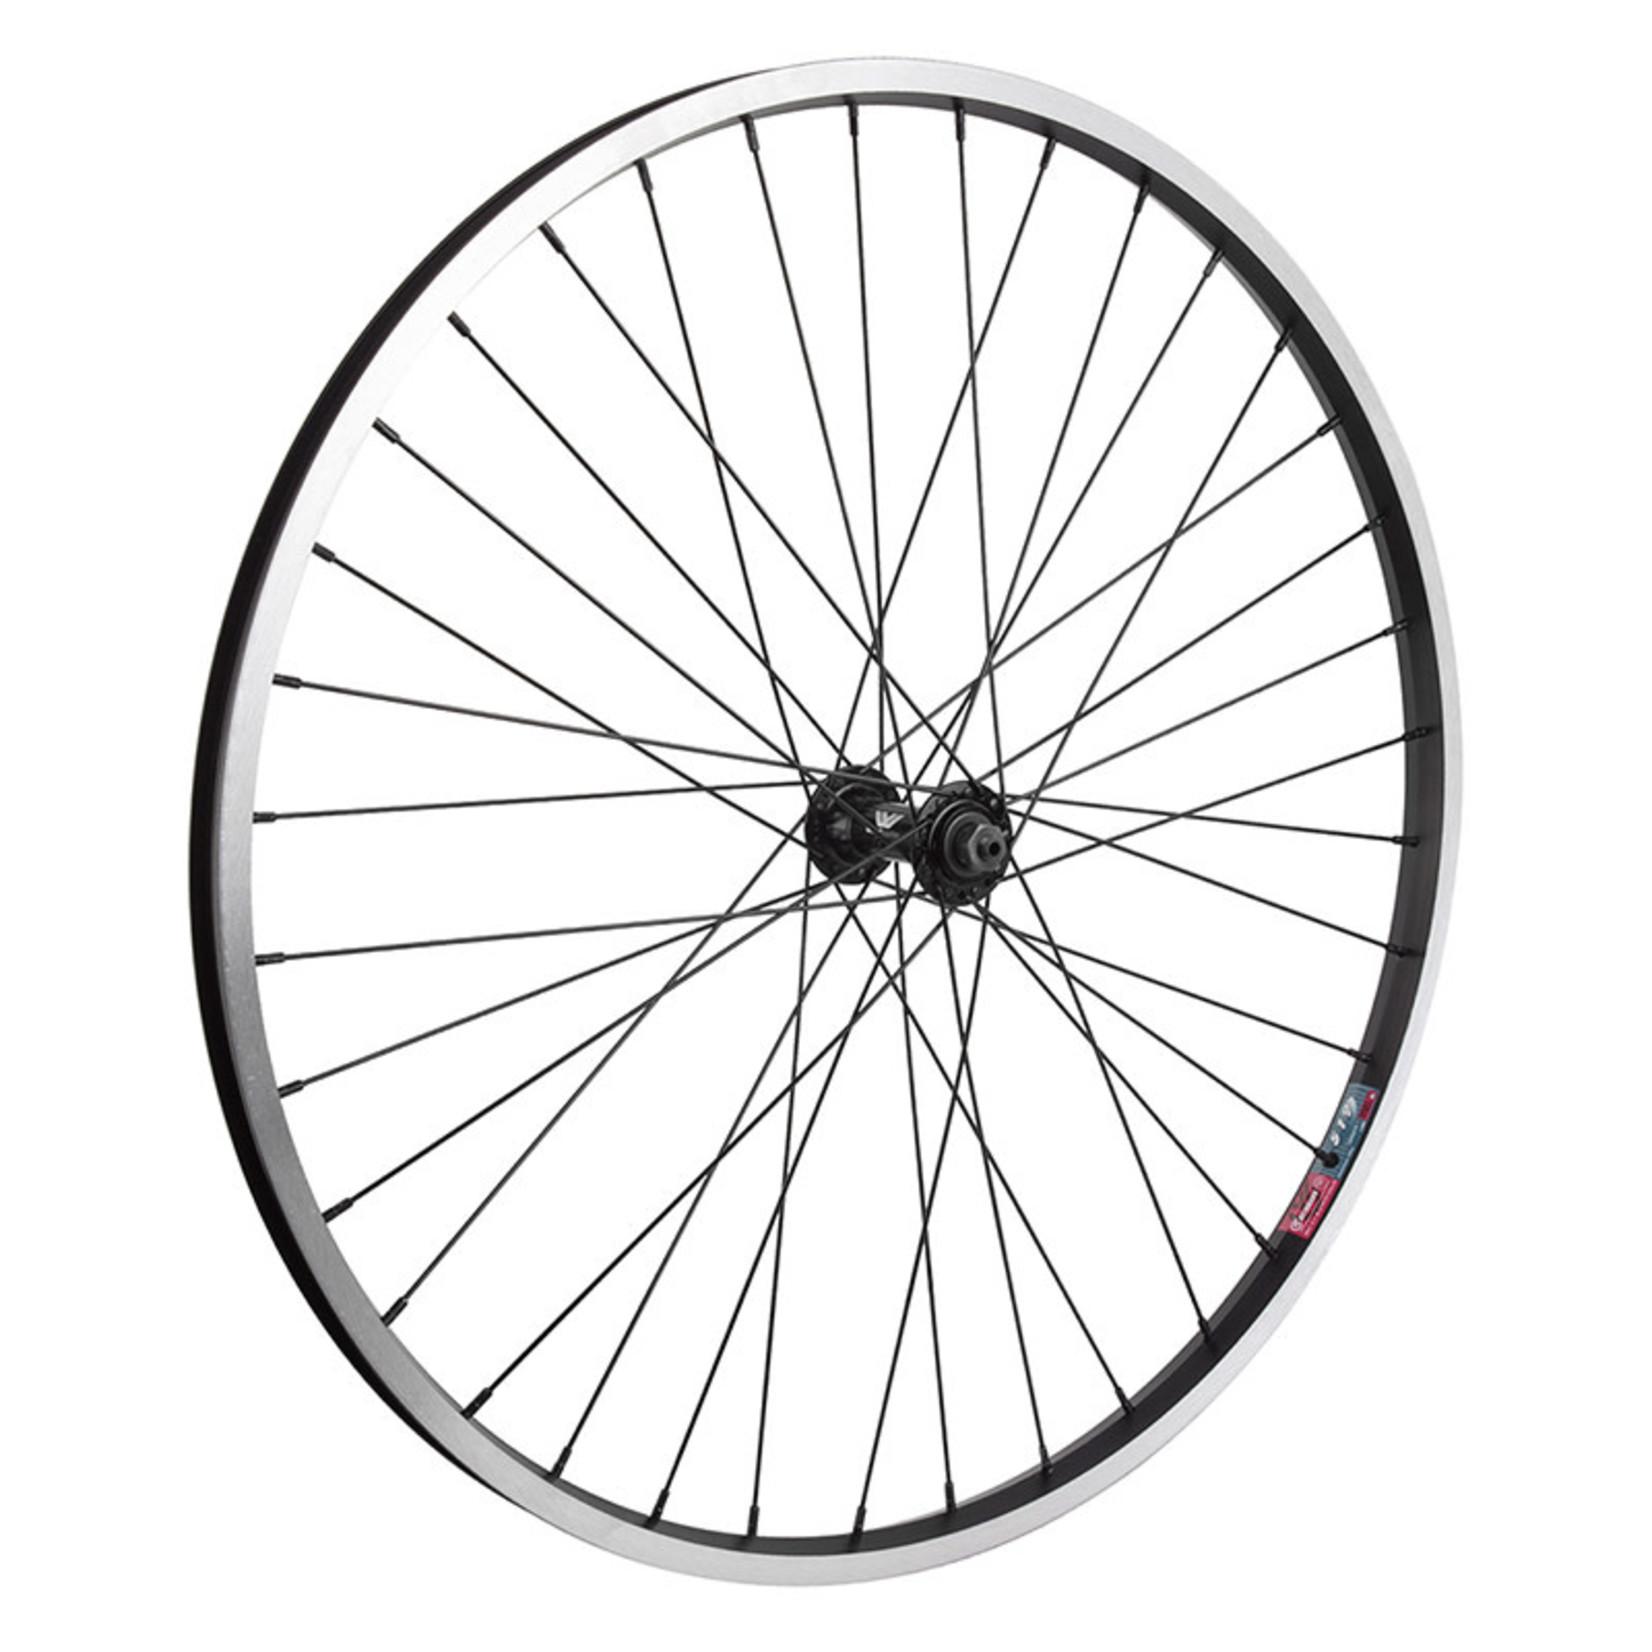 "26"" Front Wheel Alloy Mountain Single Wall QR 14g Black w/MSW"